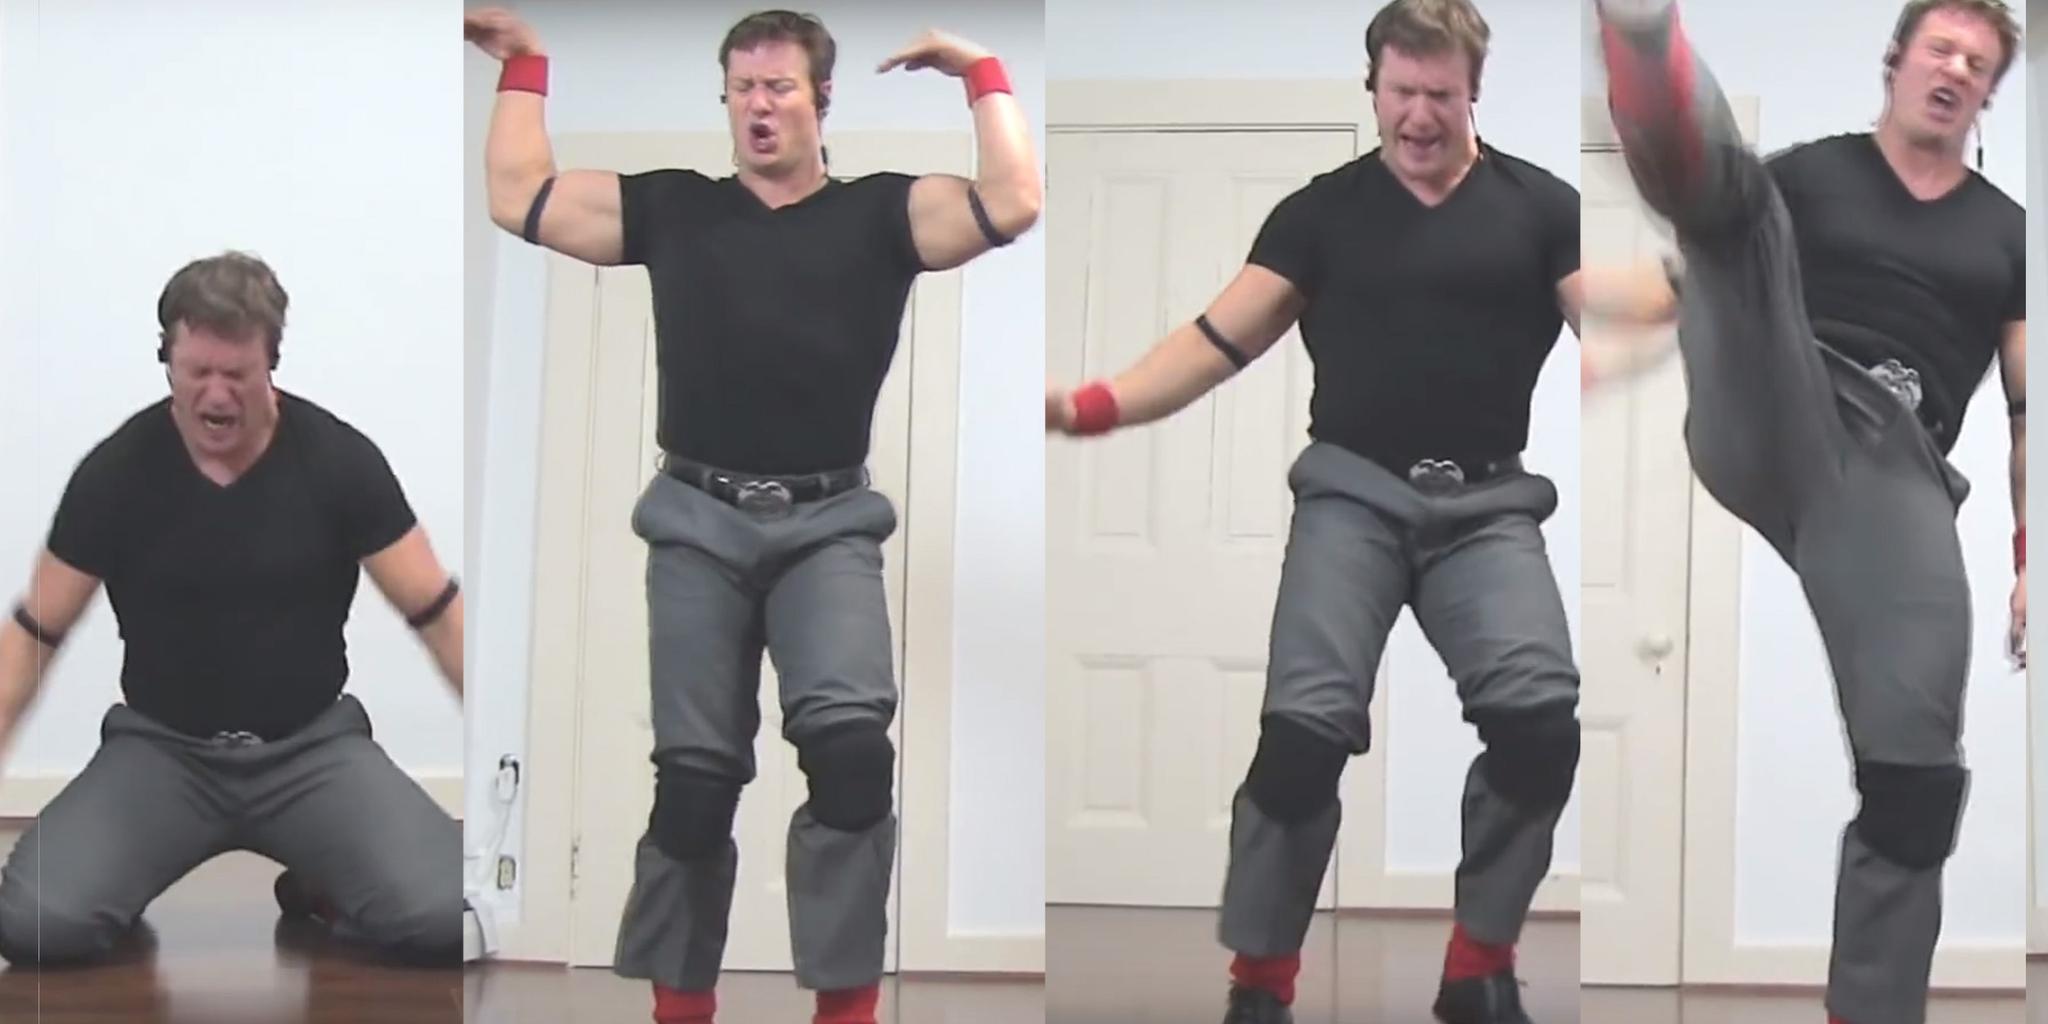 sequence of images of Ben Ryan Metzger dancing